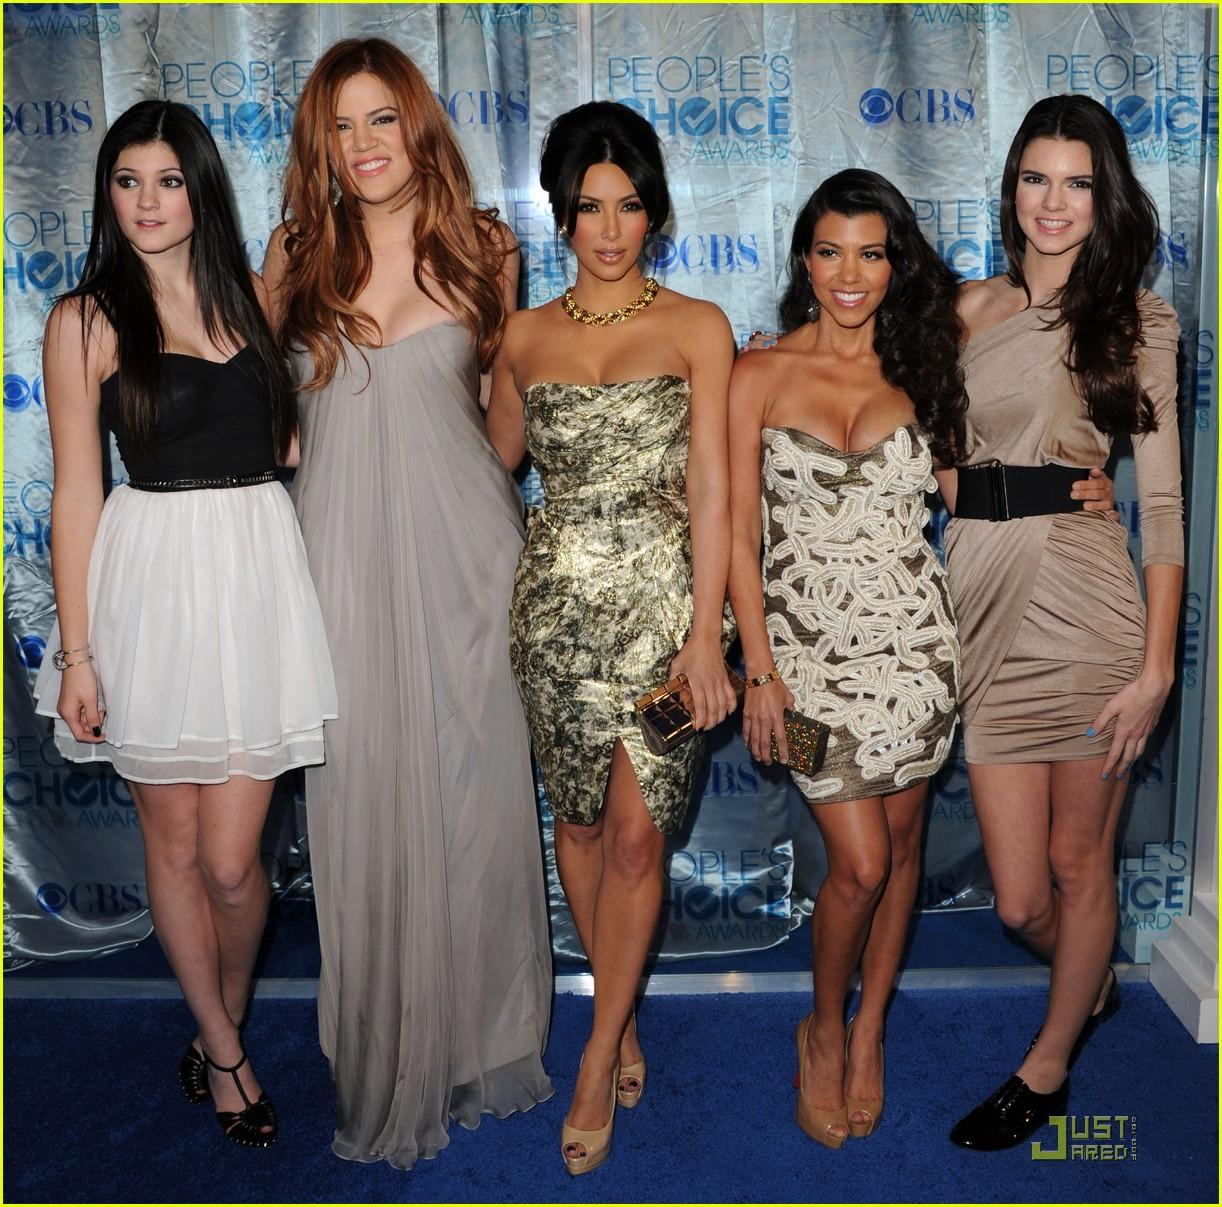 http://3.bp.blogspot.com/_Uv3Hl8SzdhY/TSV9Oe7qJMI/AAAAAAAAAy0/r0zcHWSP264/s1600/kim-kardashian-pca-07.jpg